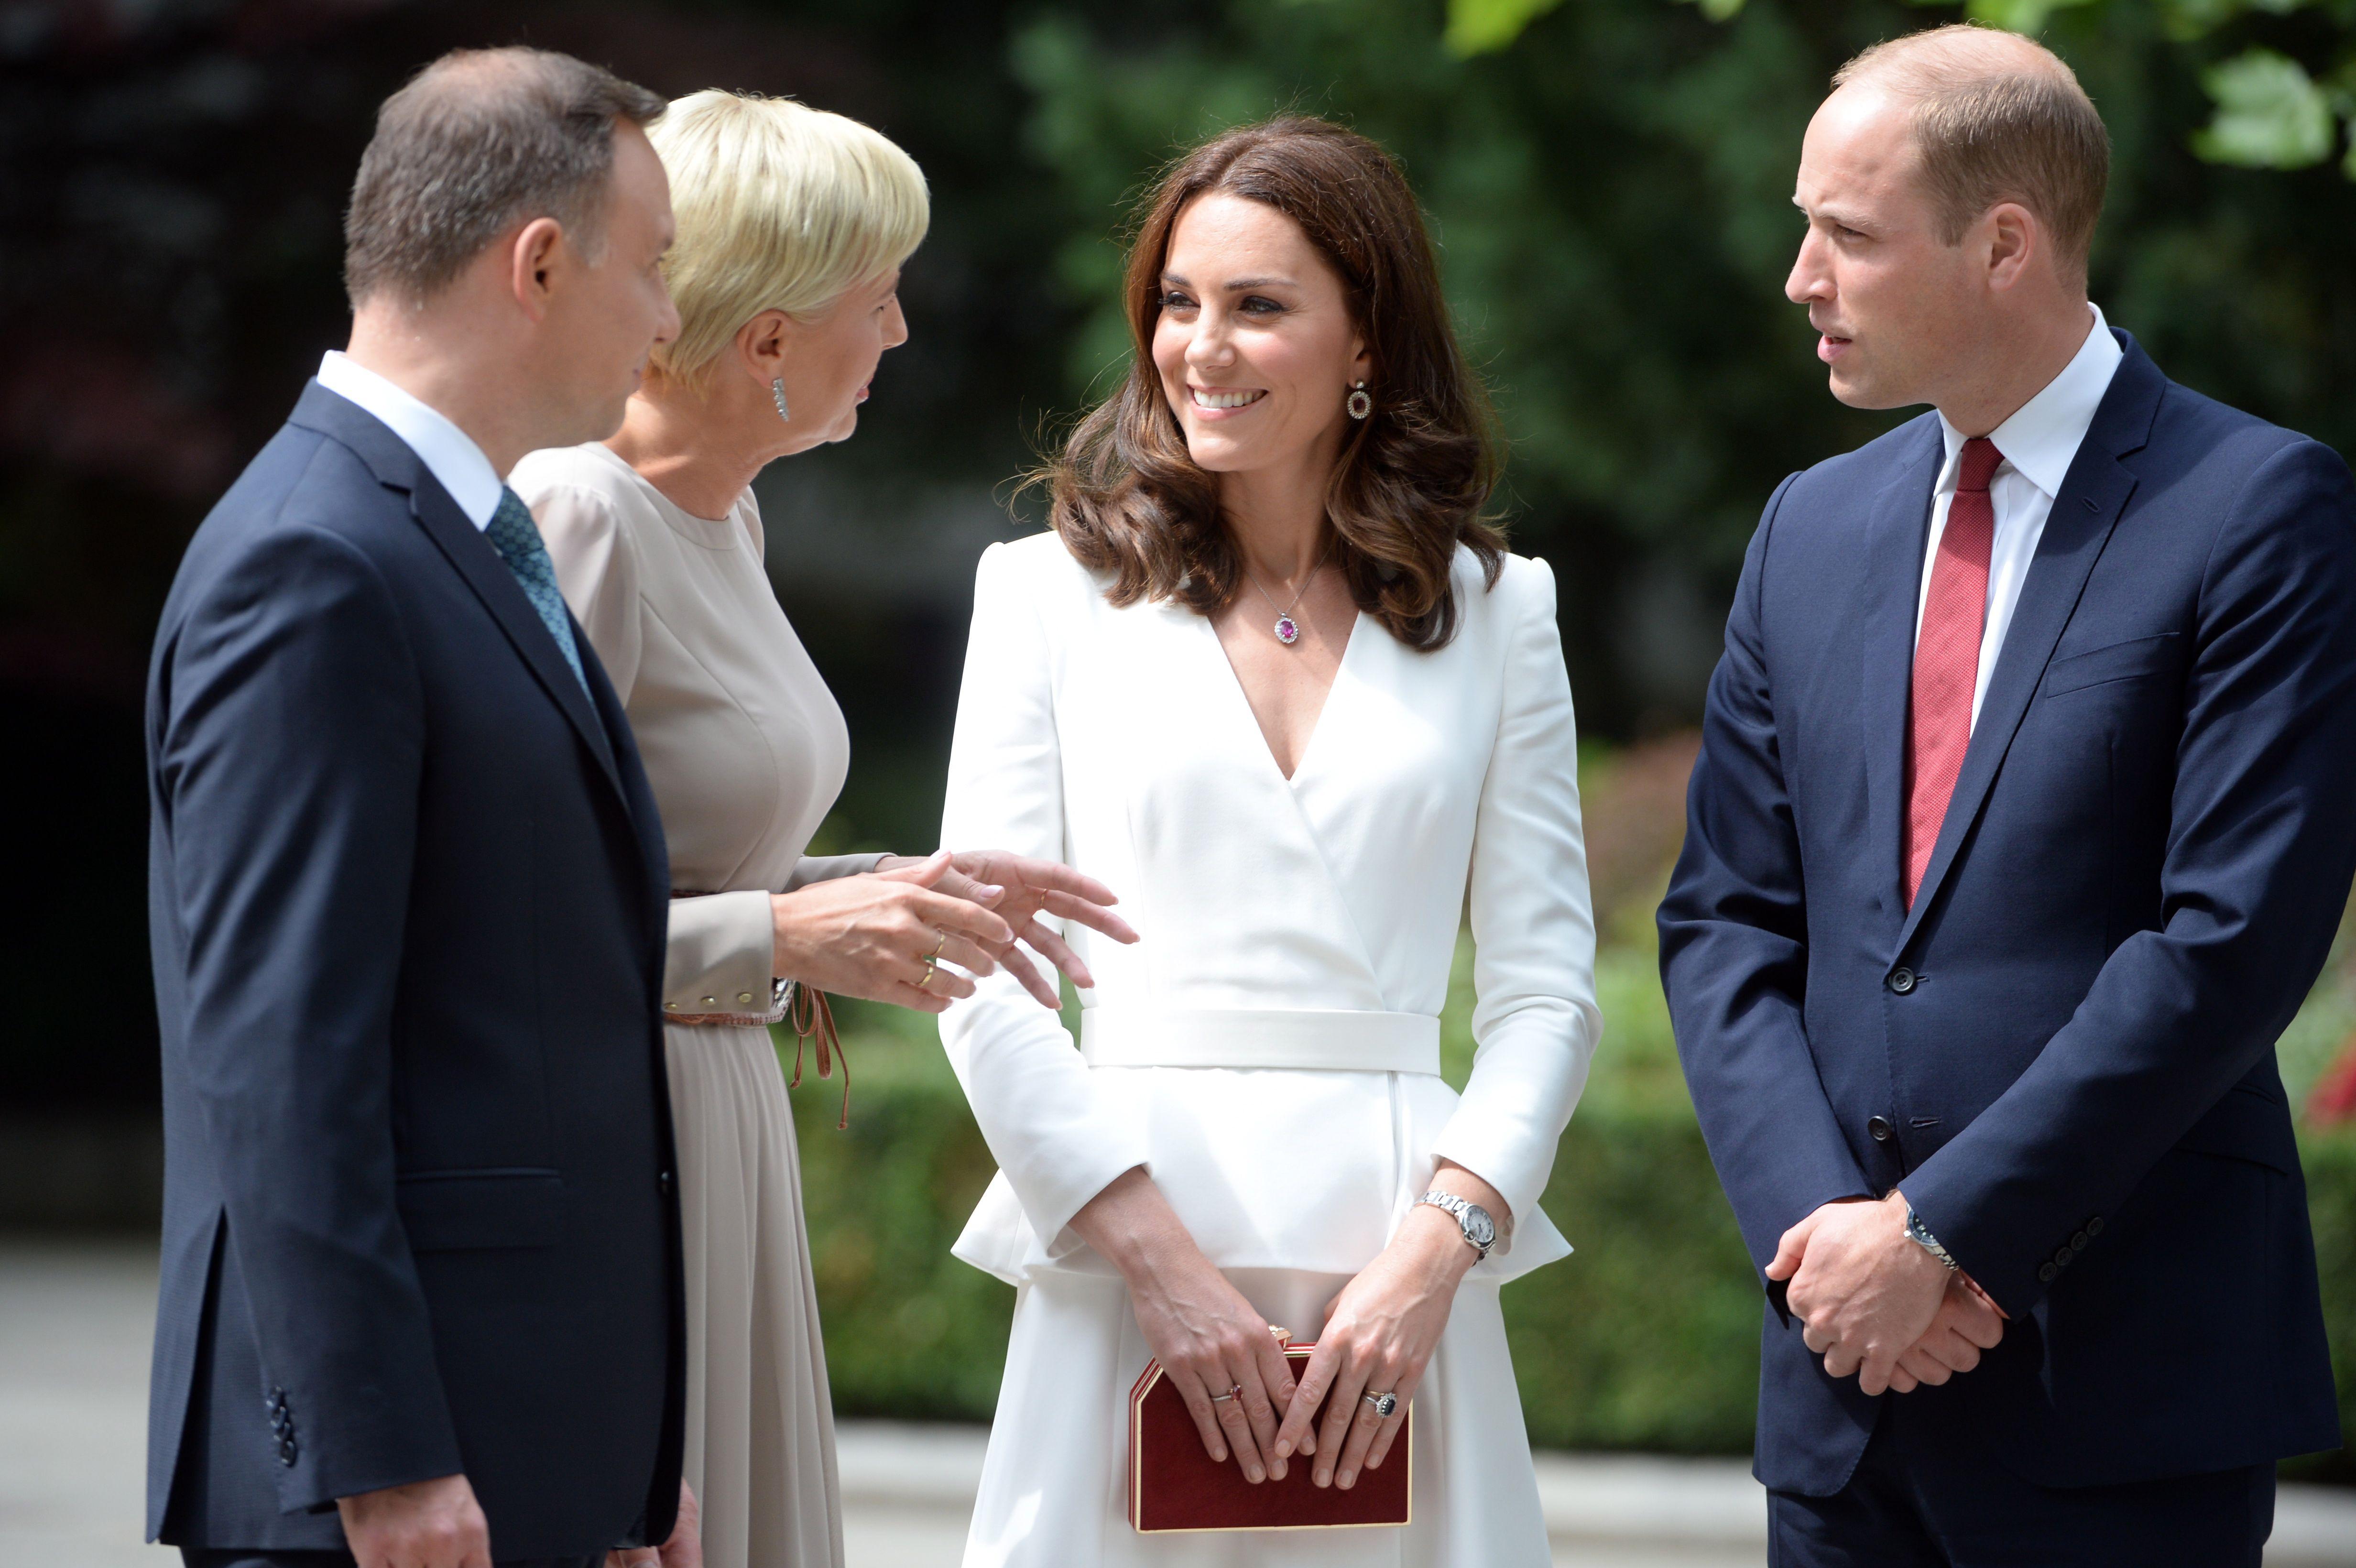 Polish President Andrzej Duda, First Lady Agata Kornhauser-Duda, the Duchess of Cambridge (in Alexander McQueen) and Prince William